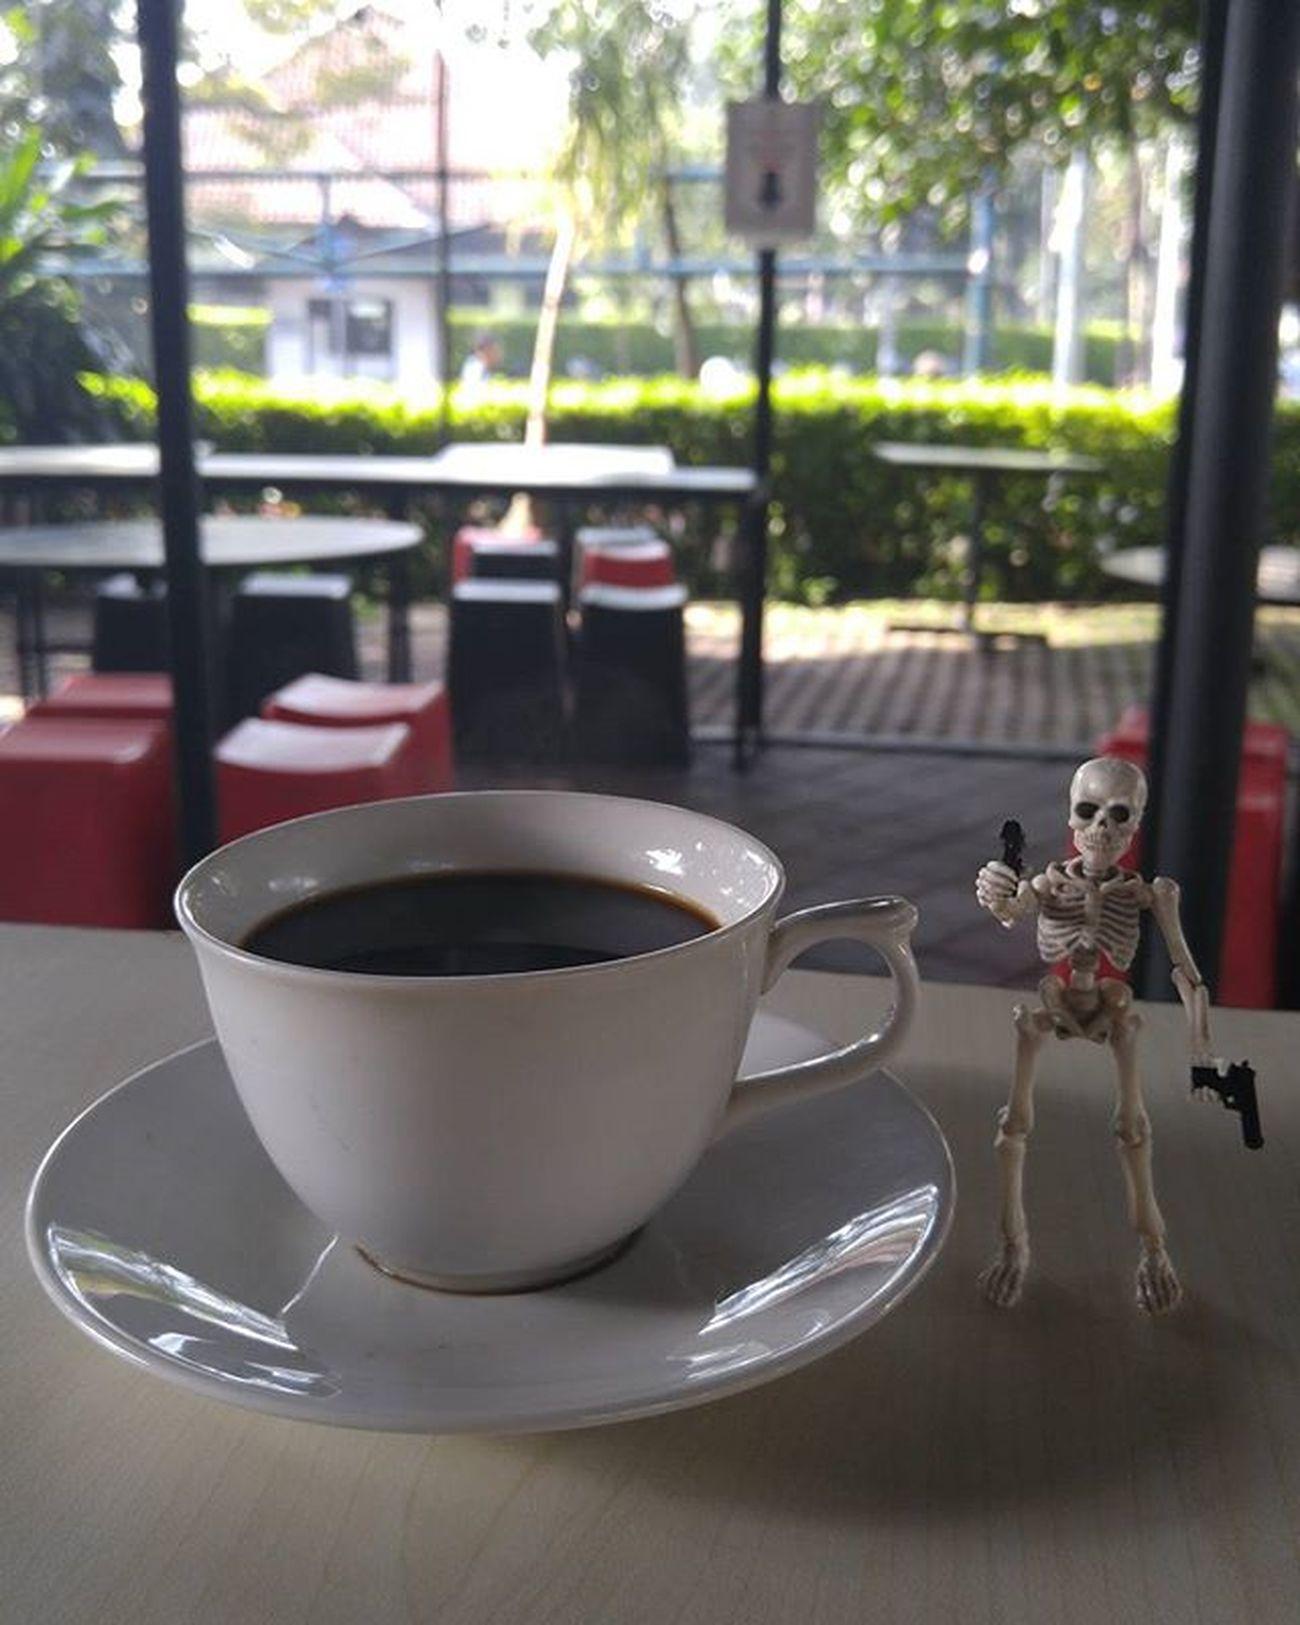 Coffee shot bang bang 💥💥 Coffee Coffeetime Blackcoffee Coffeesesh Figure Toys Skeleton Rement Poseskeleton Val  2016 LG  G4 LGG4 ☕ 😚 ☠